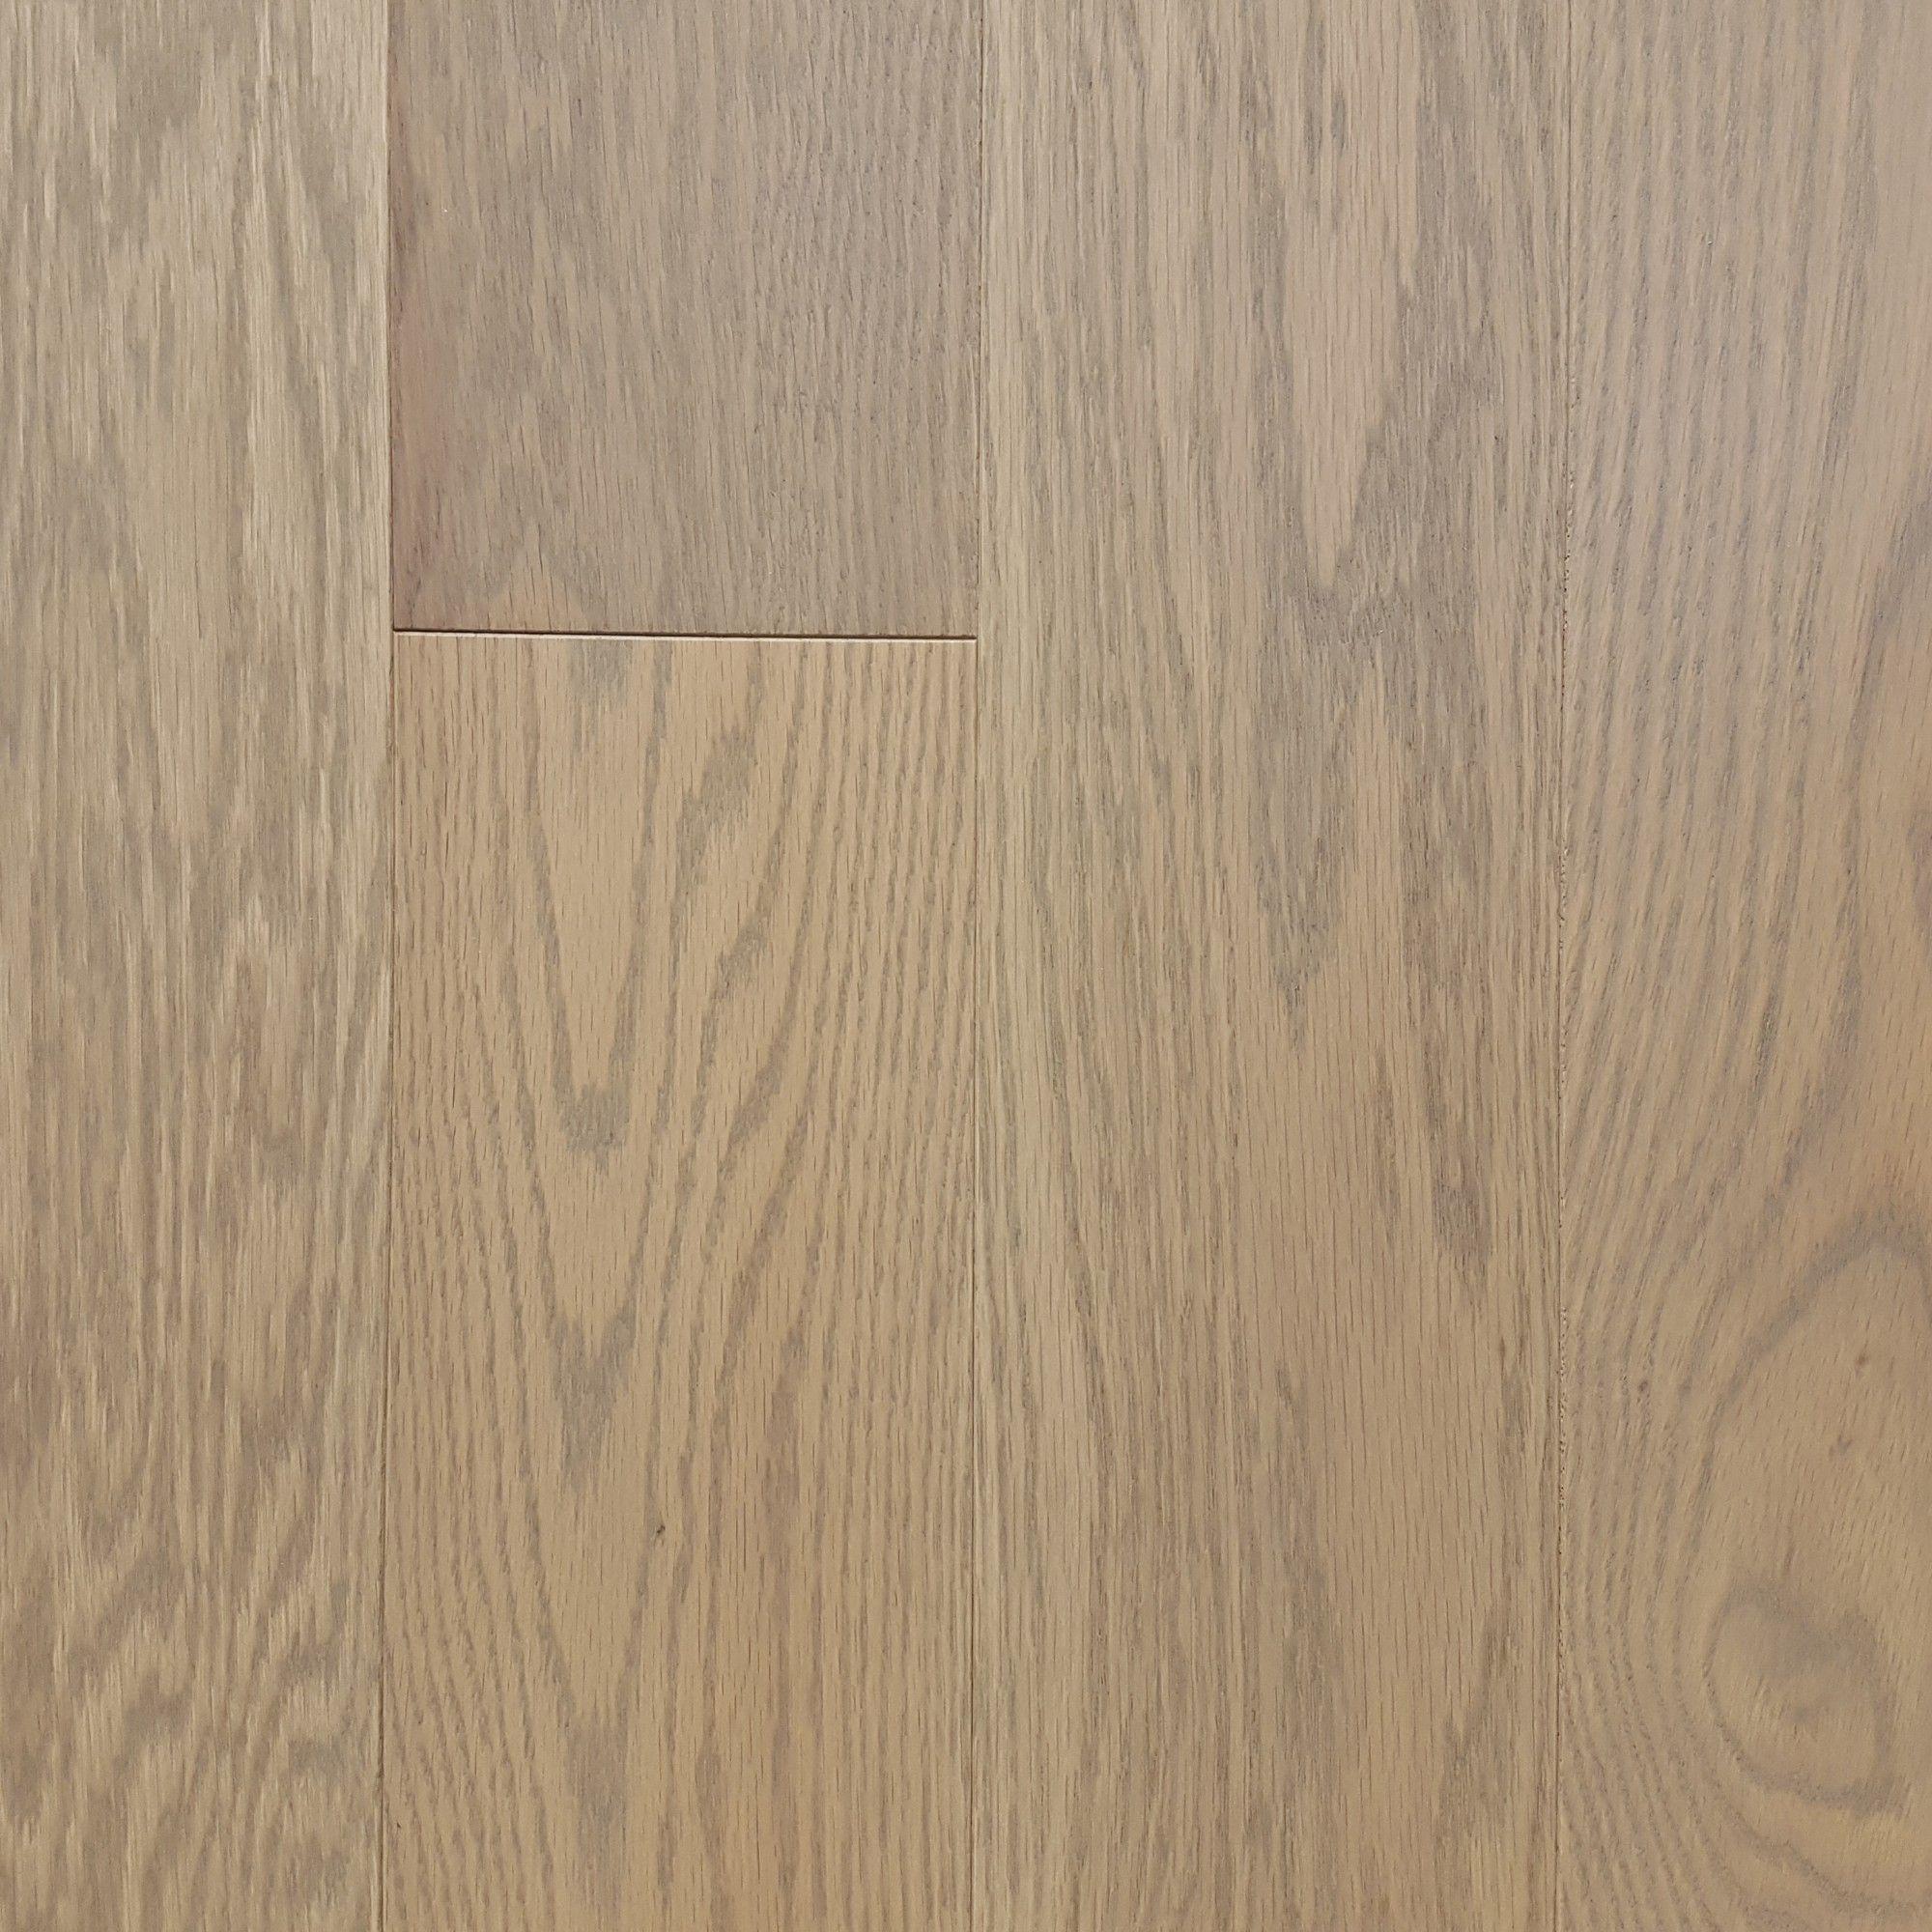 glue for engineered hardwood flooring of red oak baja vintage prefinished hardwood flooring low voc within red oak baja vintage prefinished hardwood flooring low voc take back